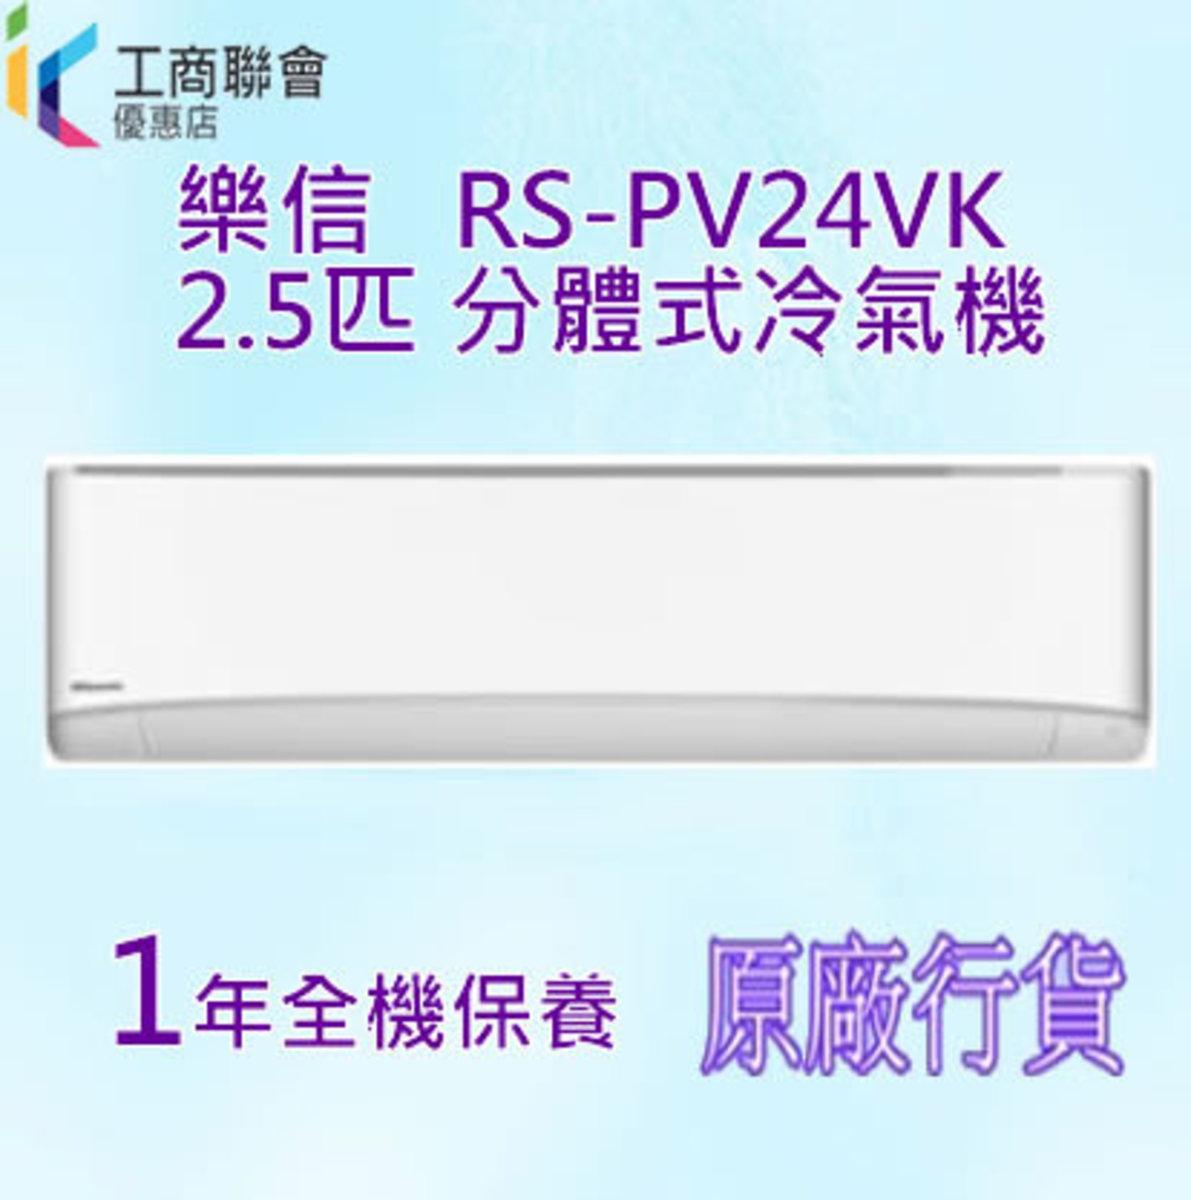 RSPV24VK 2.5HP Split Air Conditioner (Free removal service)